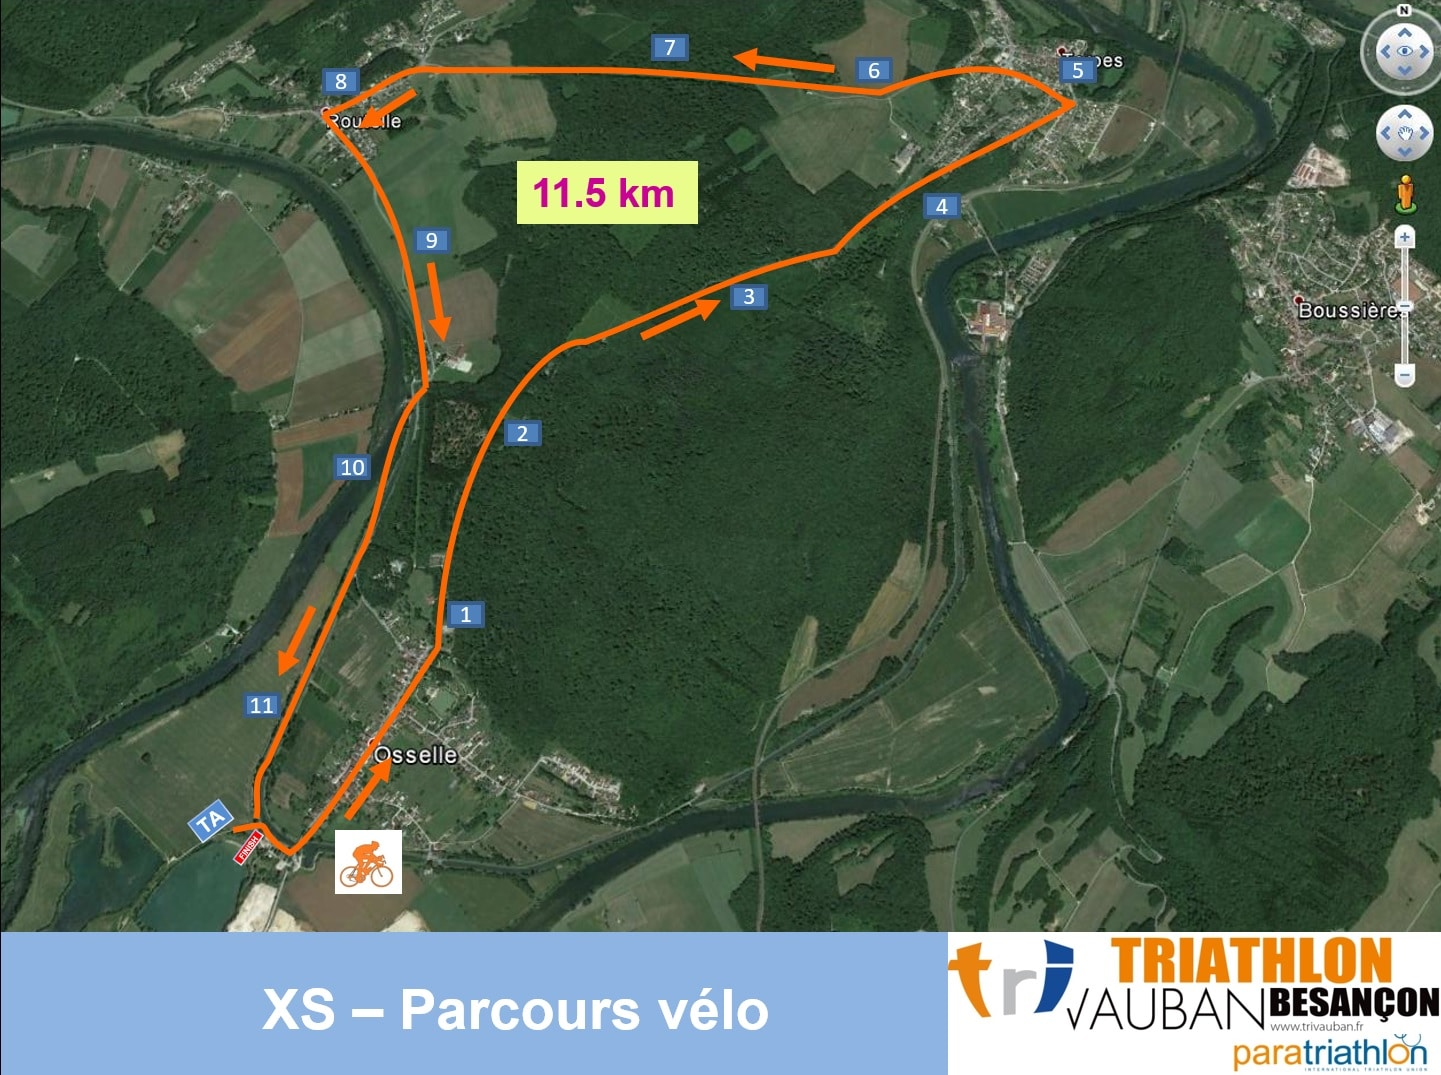 Parcours Vélo Xs Triathlon Vauban